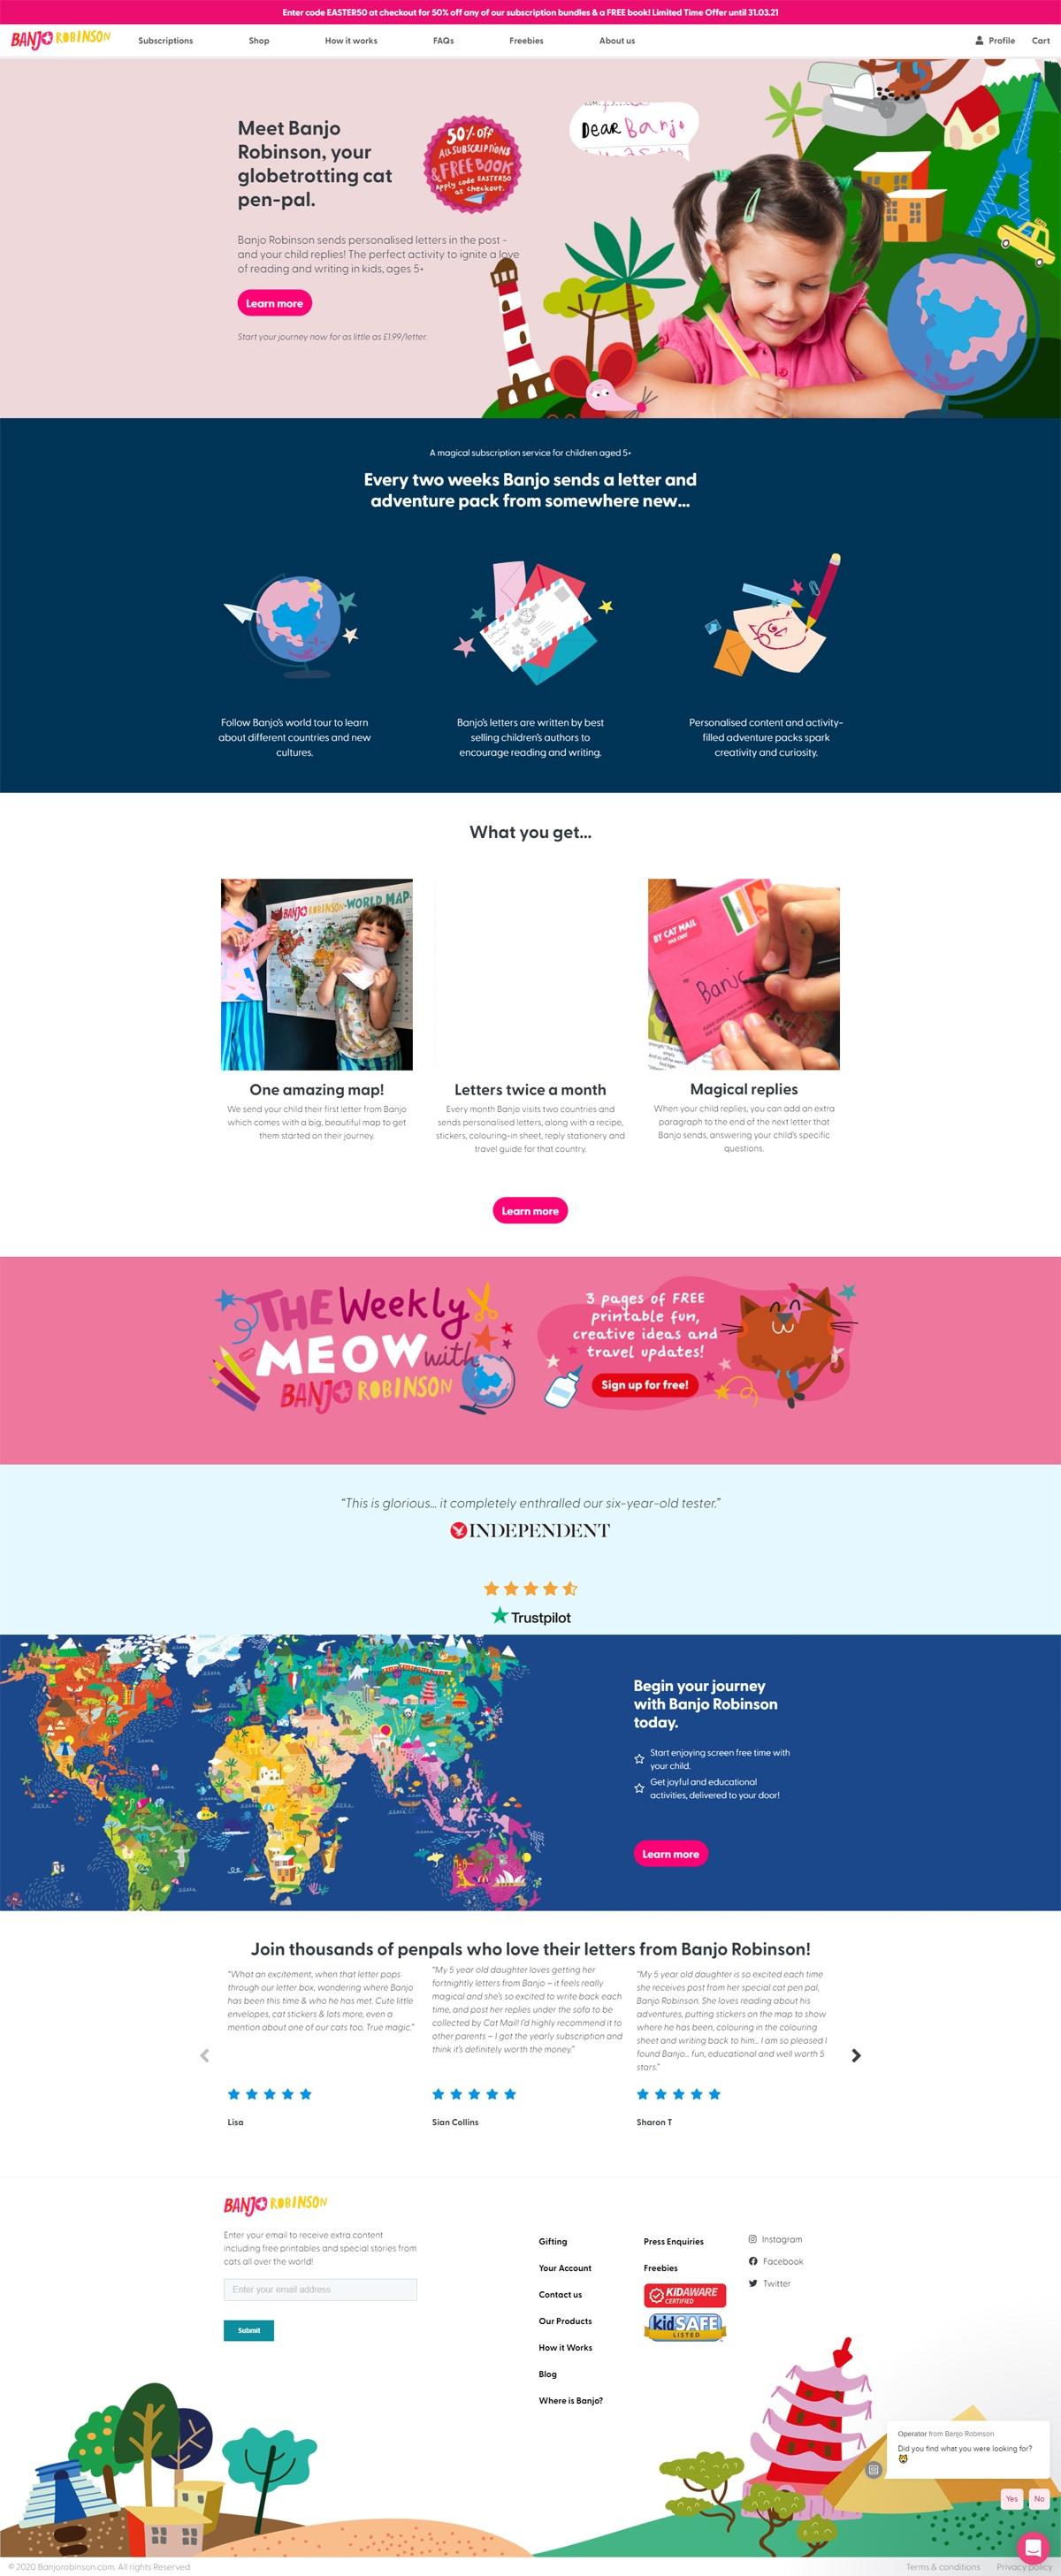 eCommerce website: Banjo Robinson